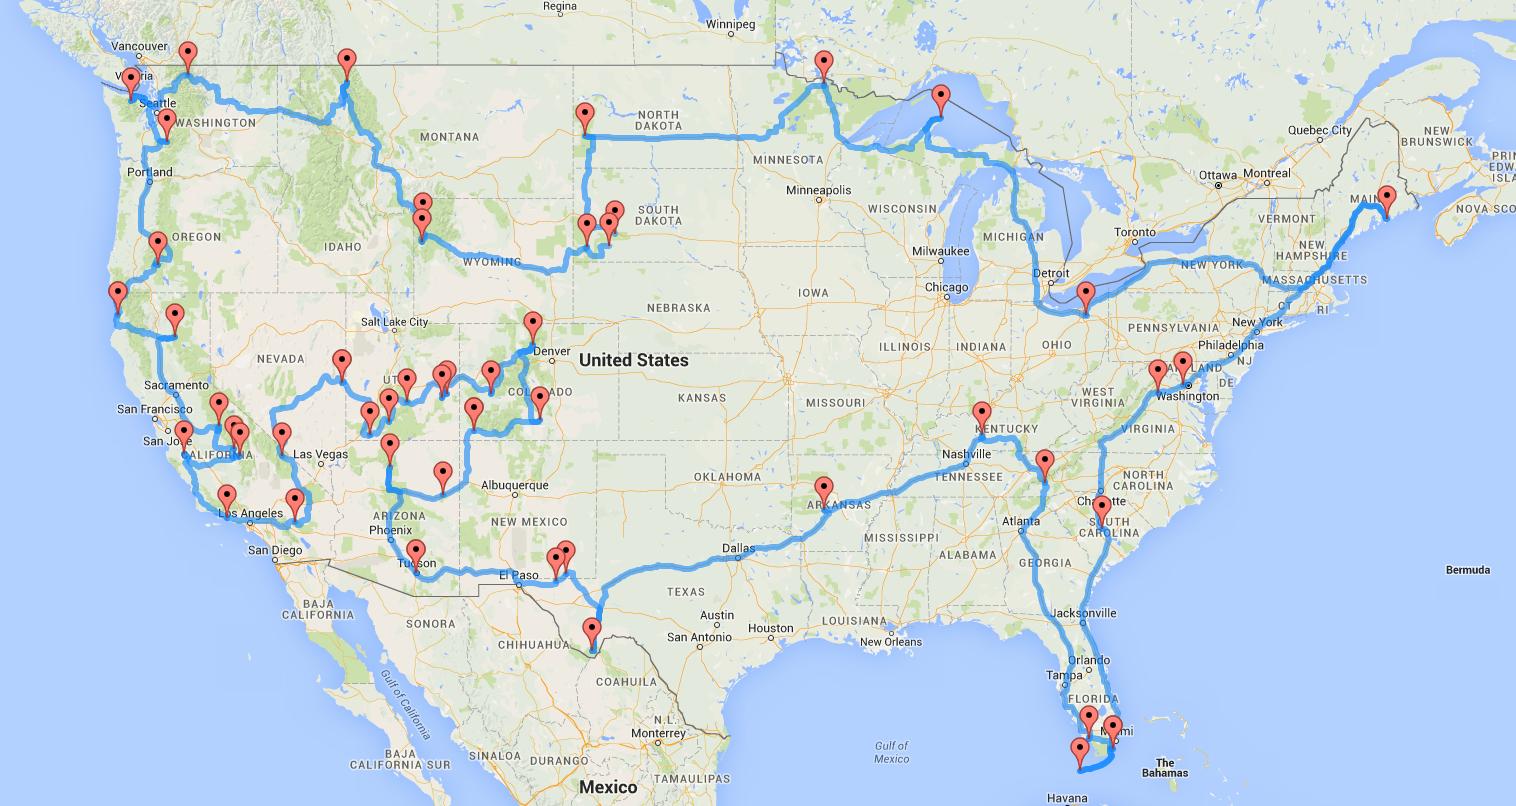 24ebf1933e02e478076f1f9177a11d68 Google Map Road Trip on google transformers, google war horse, google the internship, google shrek,